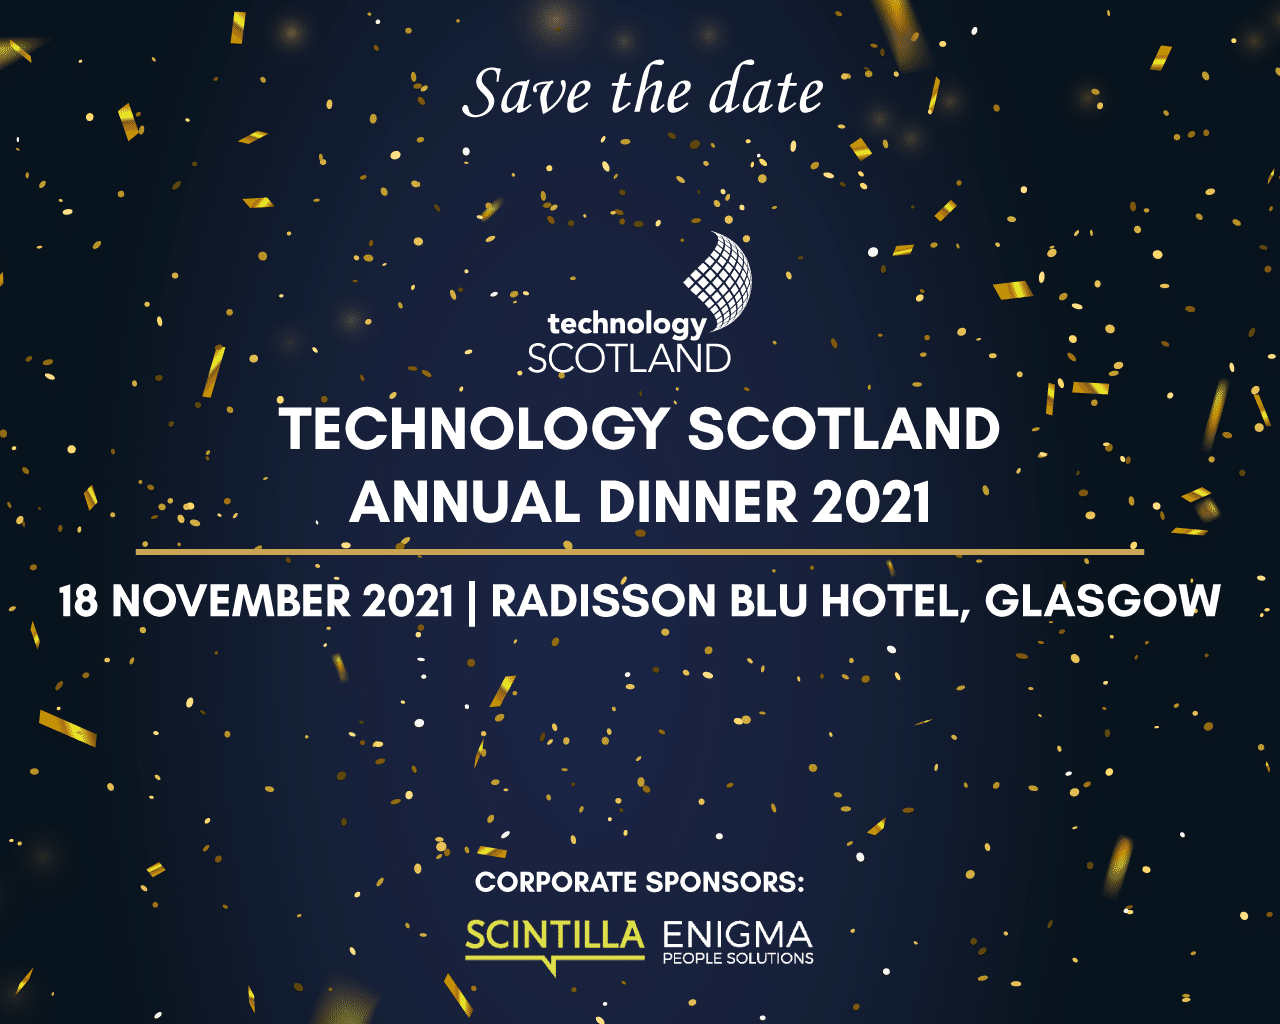 Technology Scotland's Annual Dinner 2021